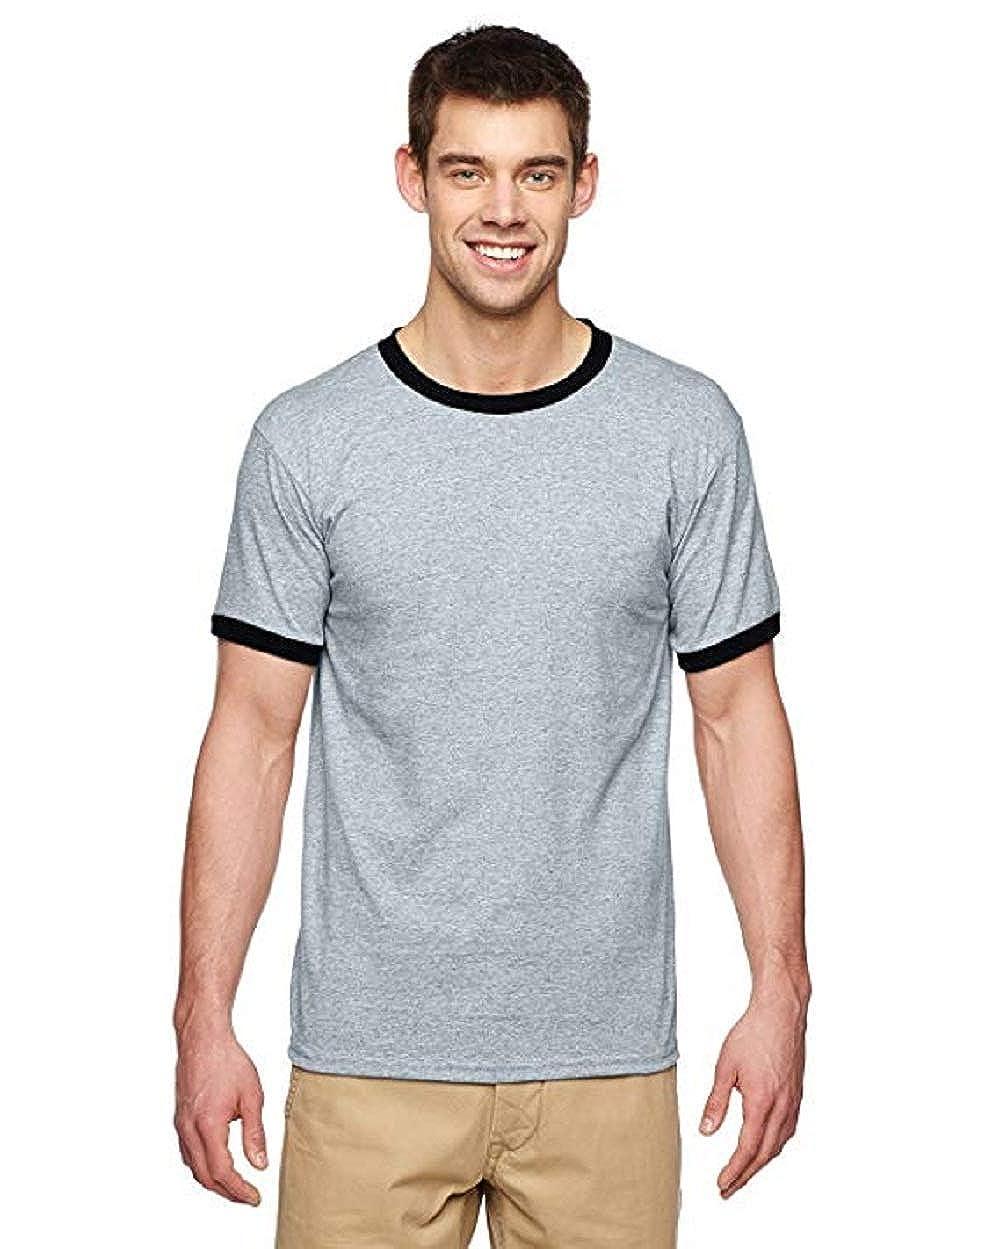 S - By Gildan Gildan Adult DryBlend 56 Oz Ringer T-Shirt White//Navy Style # G860 - Original Label